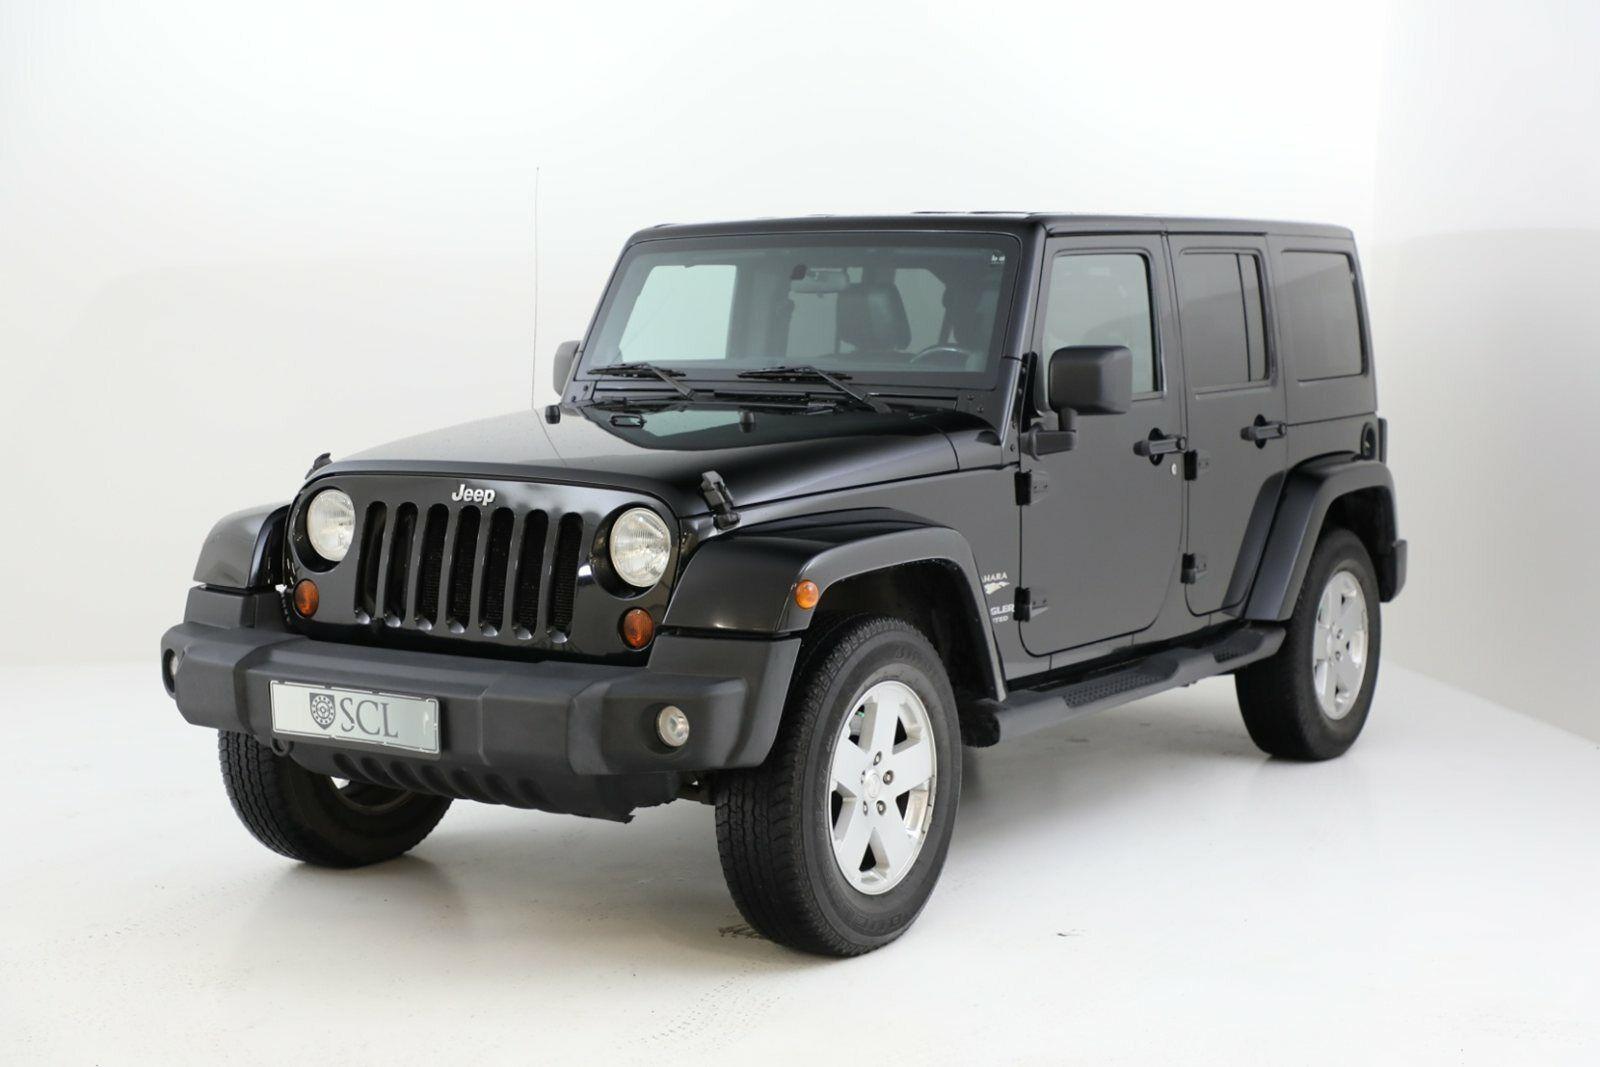 Jeep Wrangler Unlimited 3,8 Sahara aut. 5d